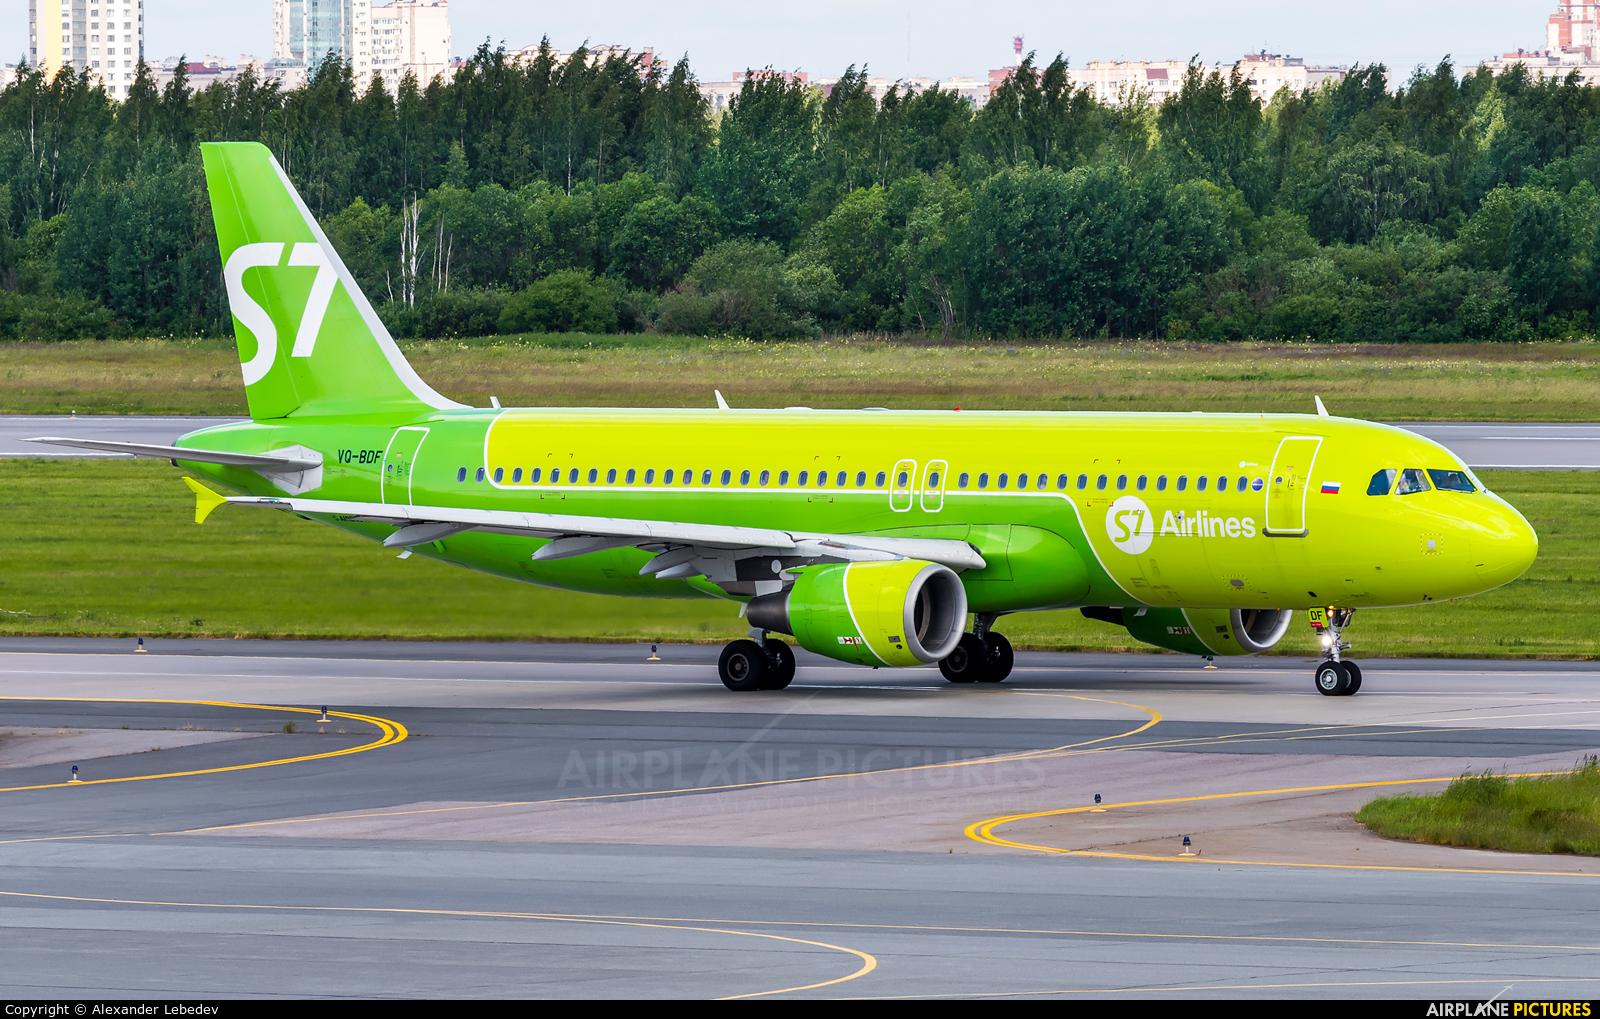 S7 Airlines VQ-BDF aircraft at St. Petersburg - Pulkovo